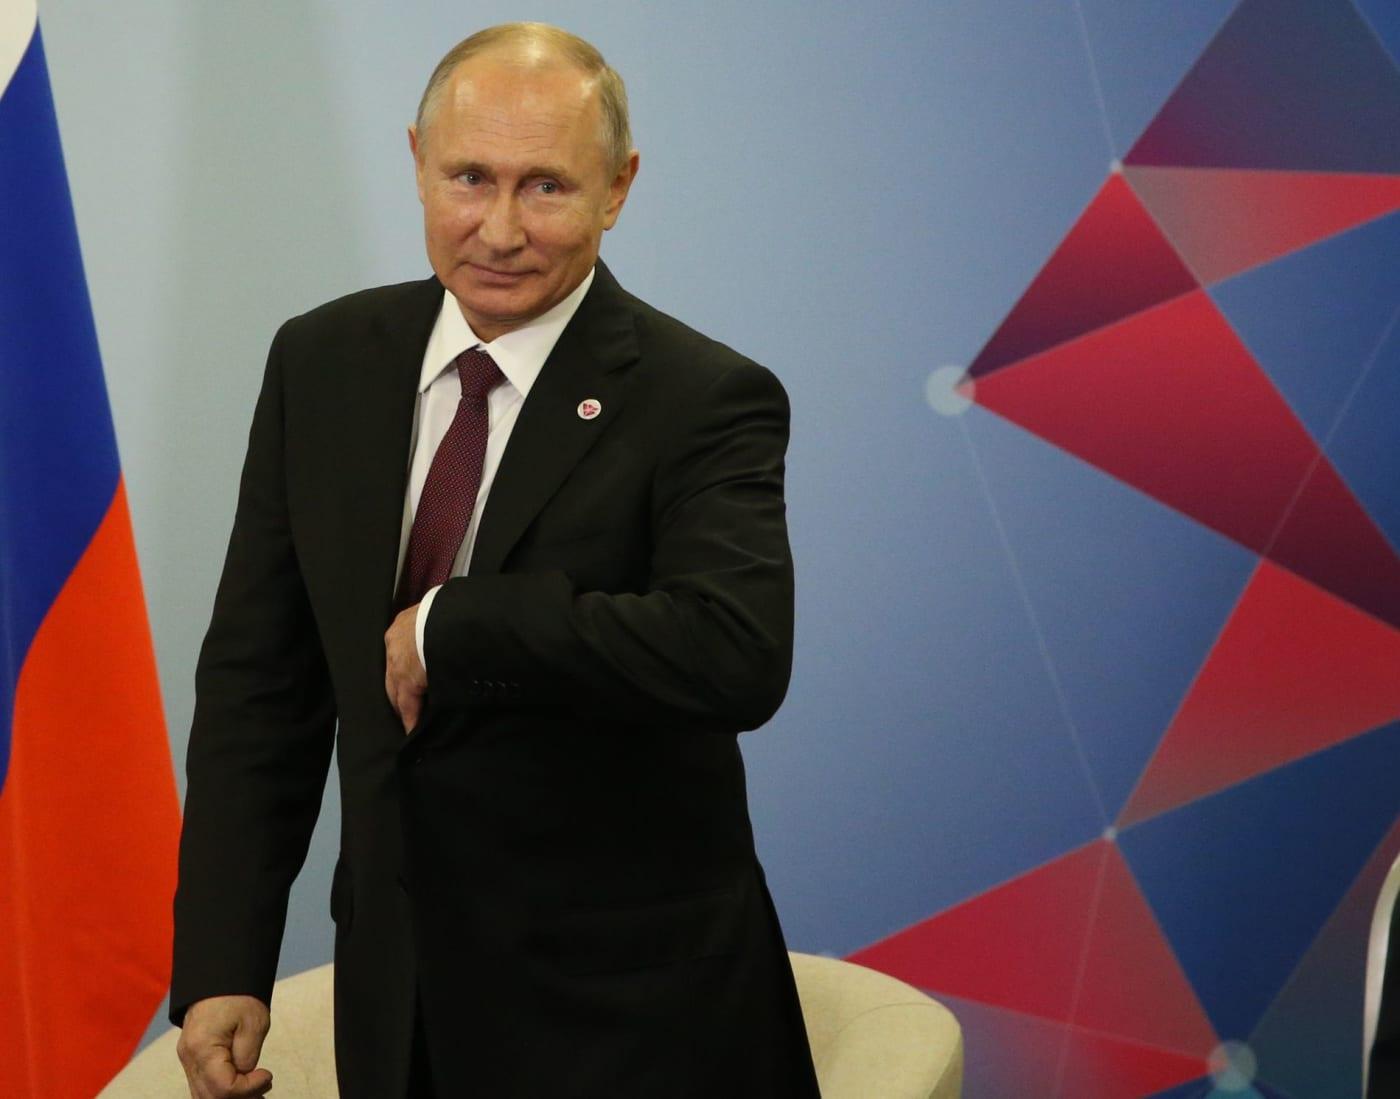 Vladimir Putin onstage